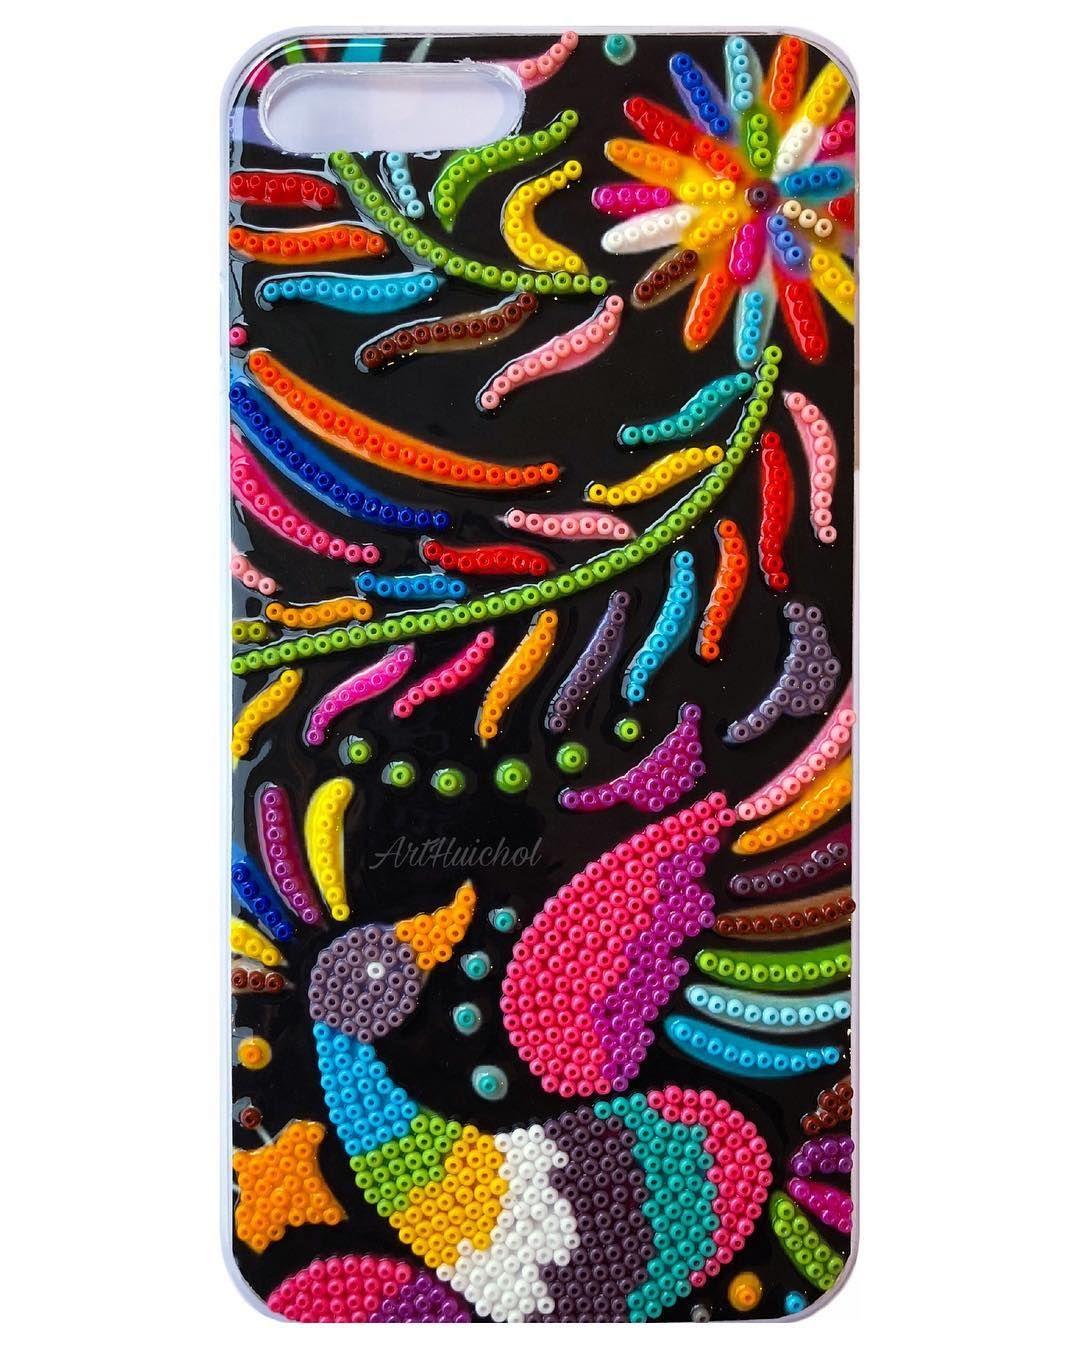 8abcbbf44ce Funda Artesanal Tenango Otomi Se personalizan para cualquier modelo de  celular de cualquier marca!!! Pedidos e informe